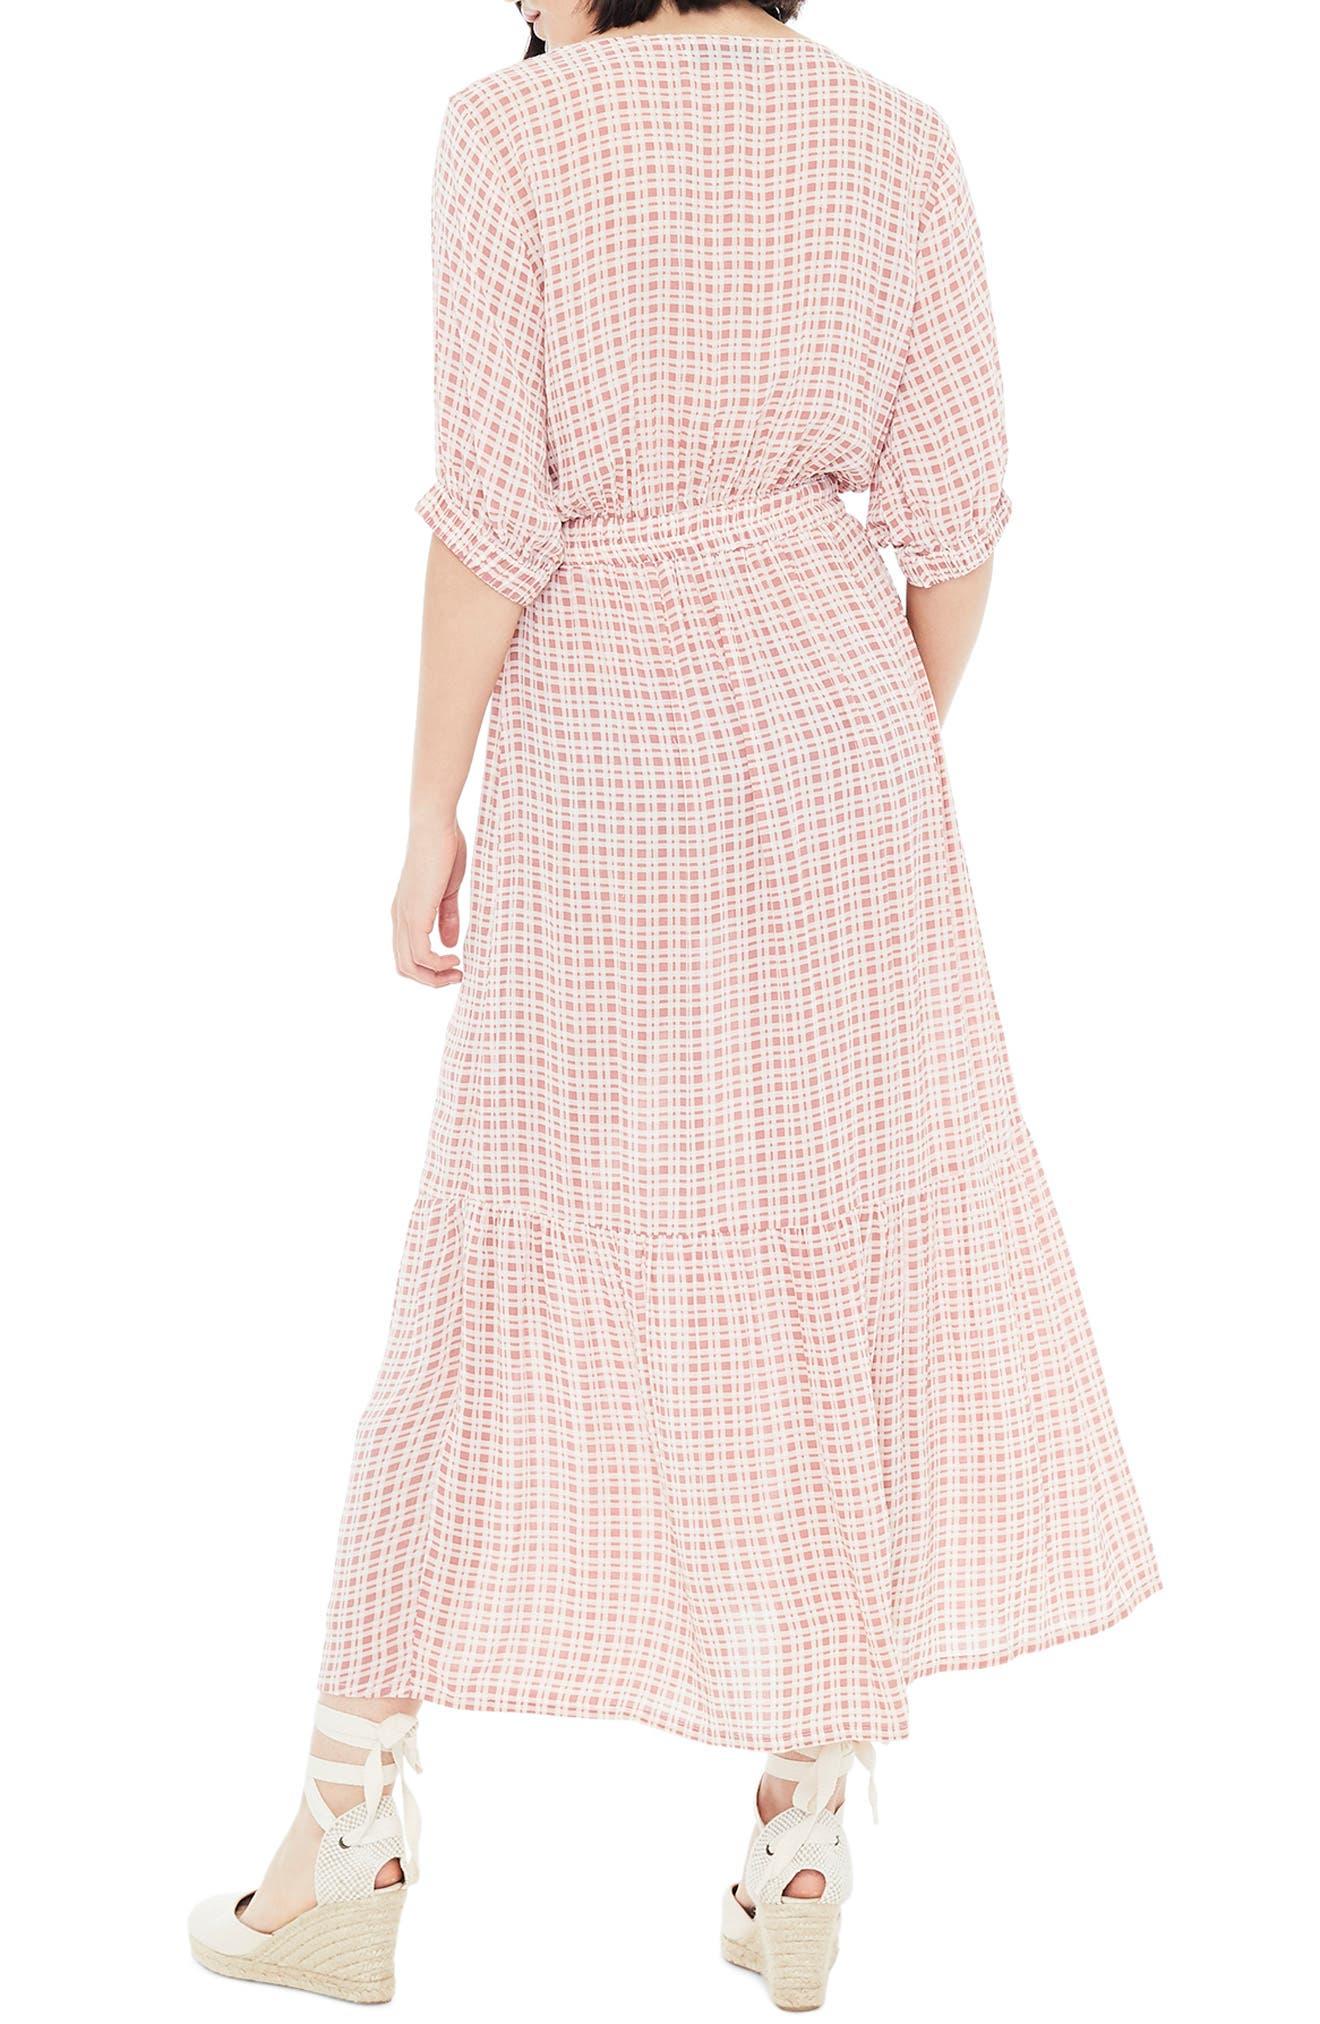 FAITHFULL THE BRAND,                             Maple Midi Dress,                             Alternate thumbnail 2, color,                             EMILINAH CHECK PRINT